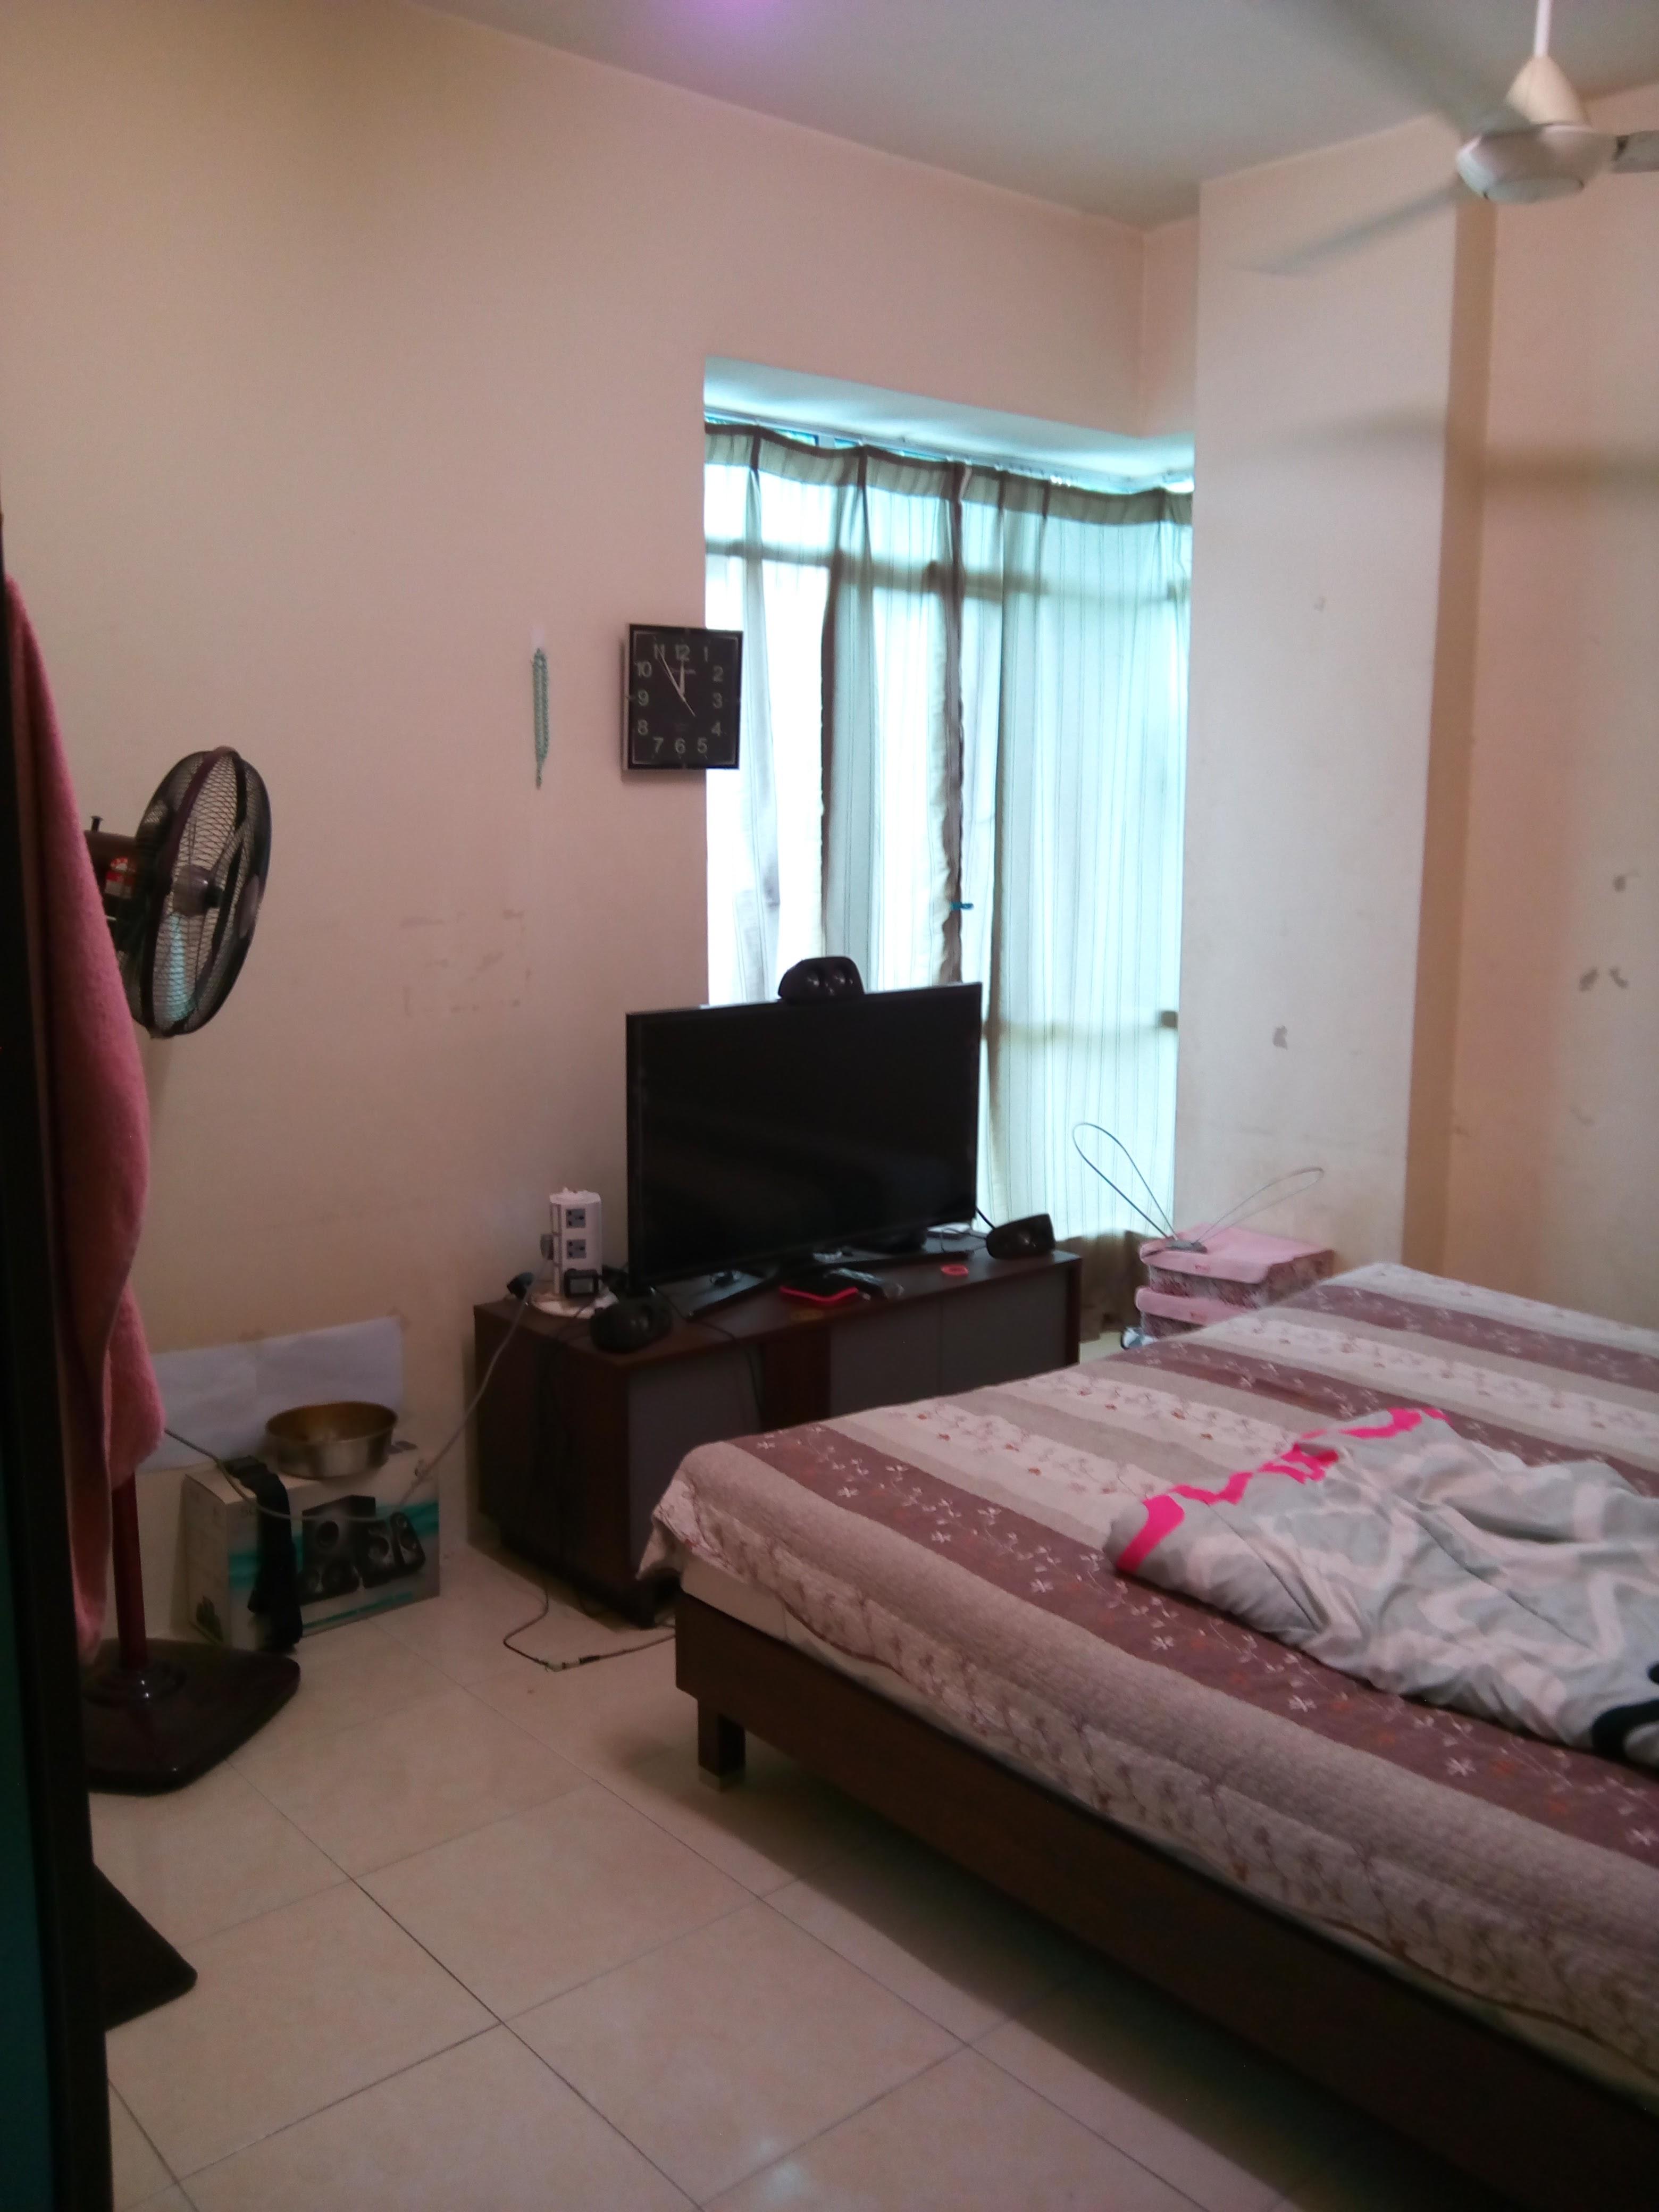 Kajang,Selangor,Malaysia,3 Bedrooms Bedrooms,2 BathroomsBathrooms,Condo/Serviced Residence,1132